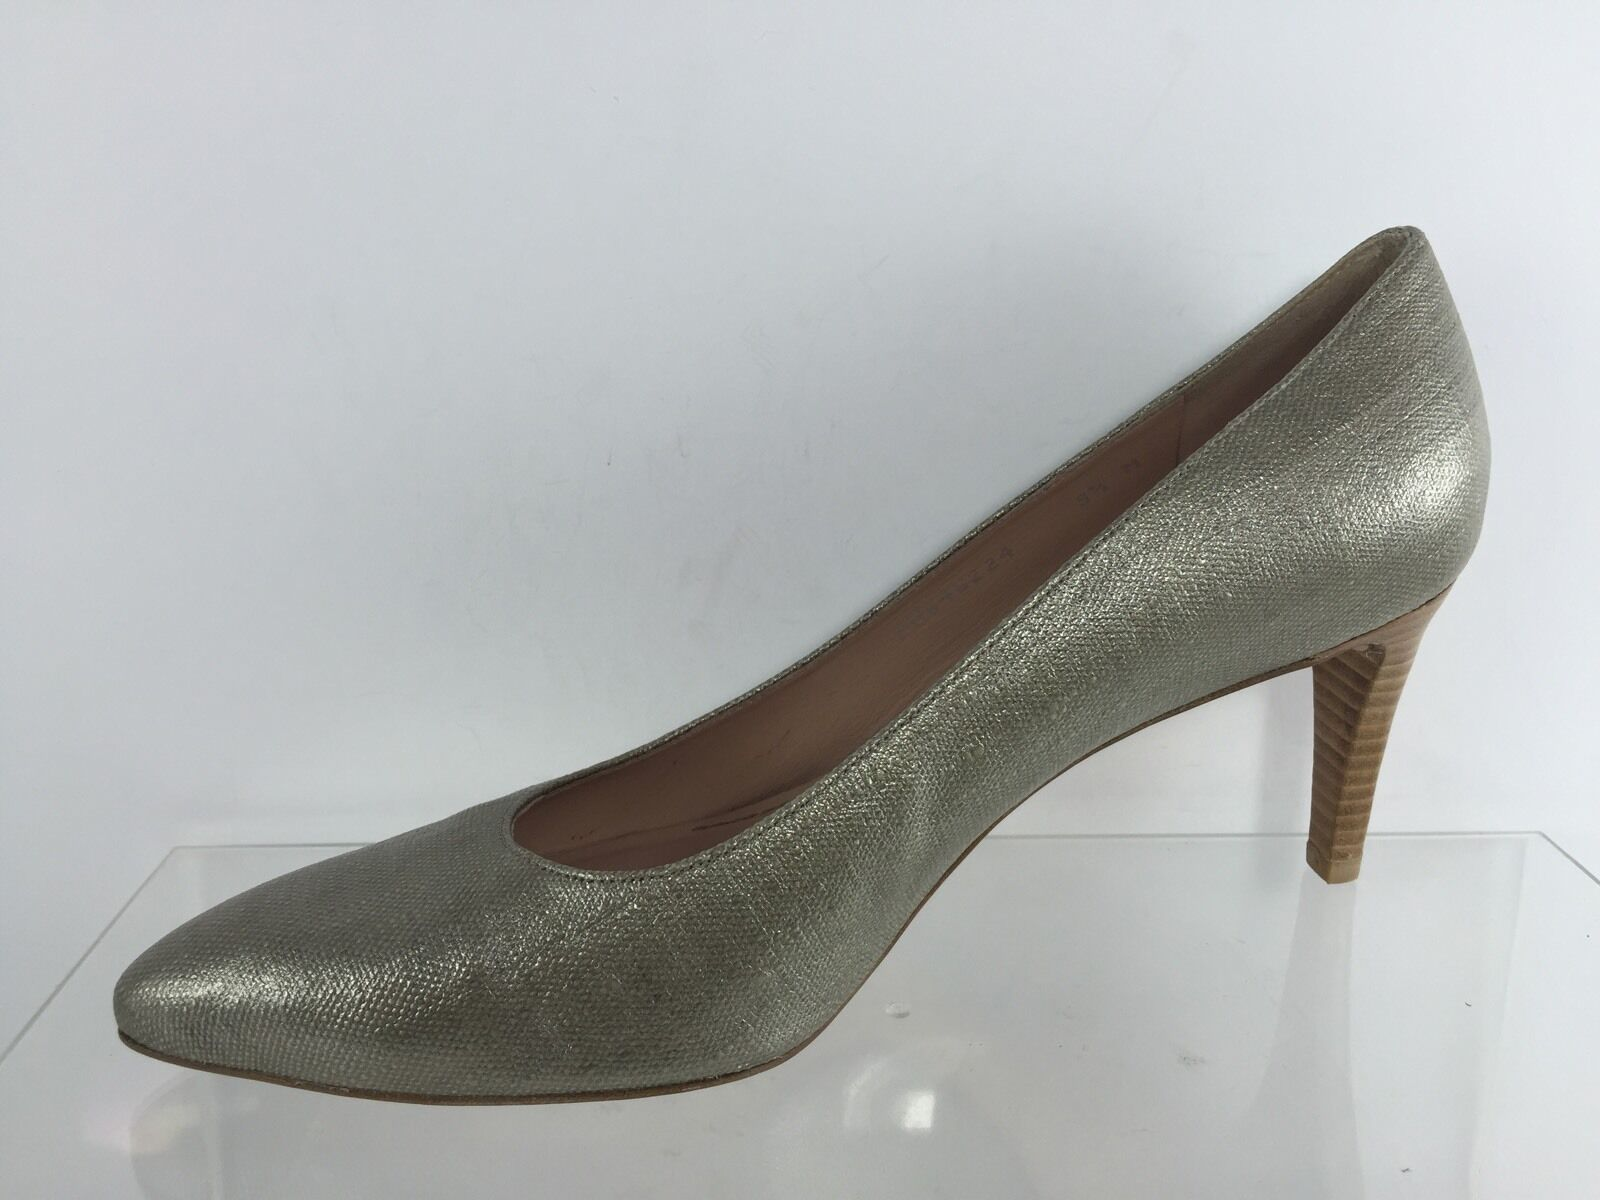 Stuart Weitzman damen damen Weitzman Pewter Heels 9.5 M 8764fc